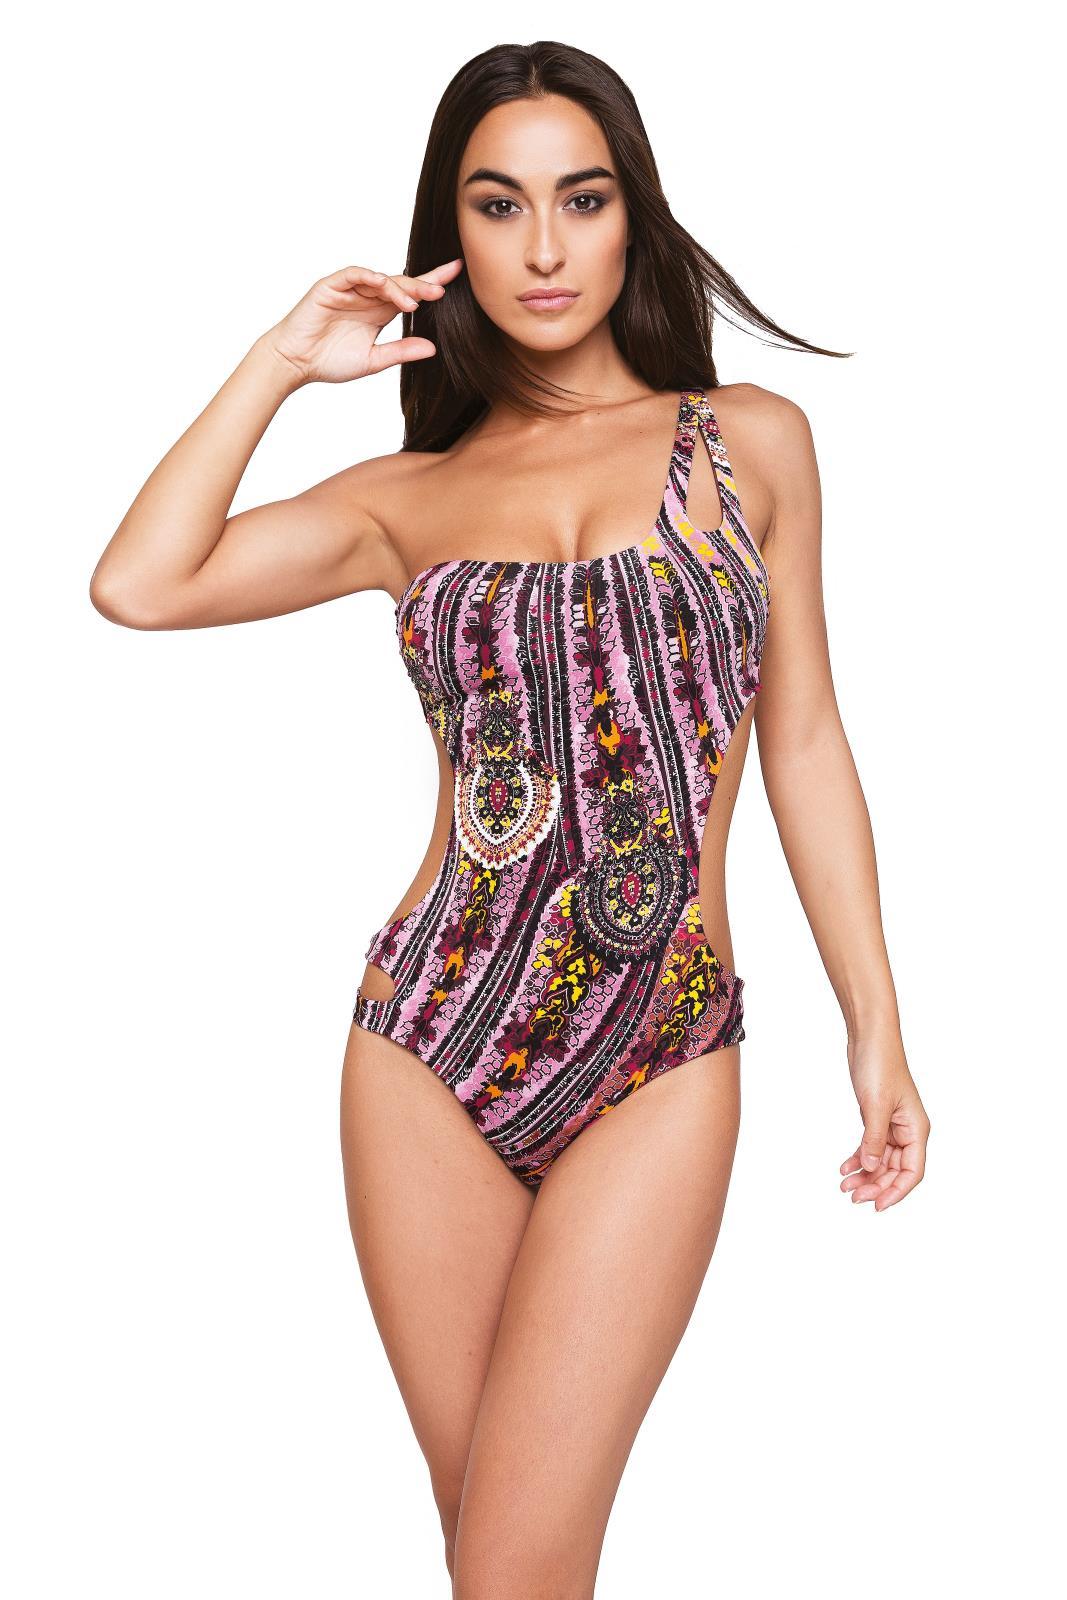 44f170d26d4 miss bikini 28413 costume intero monospalla